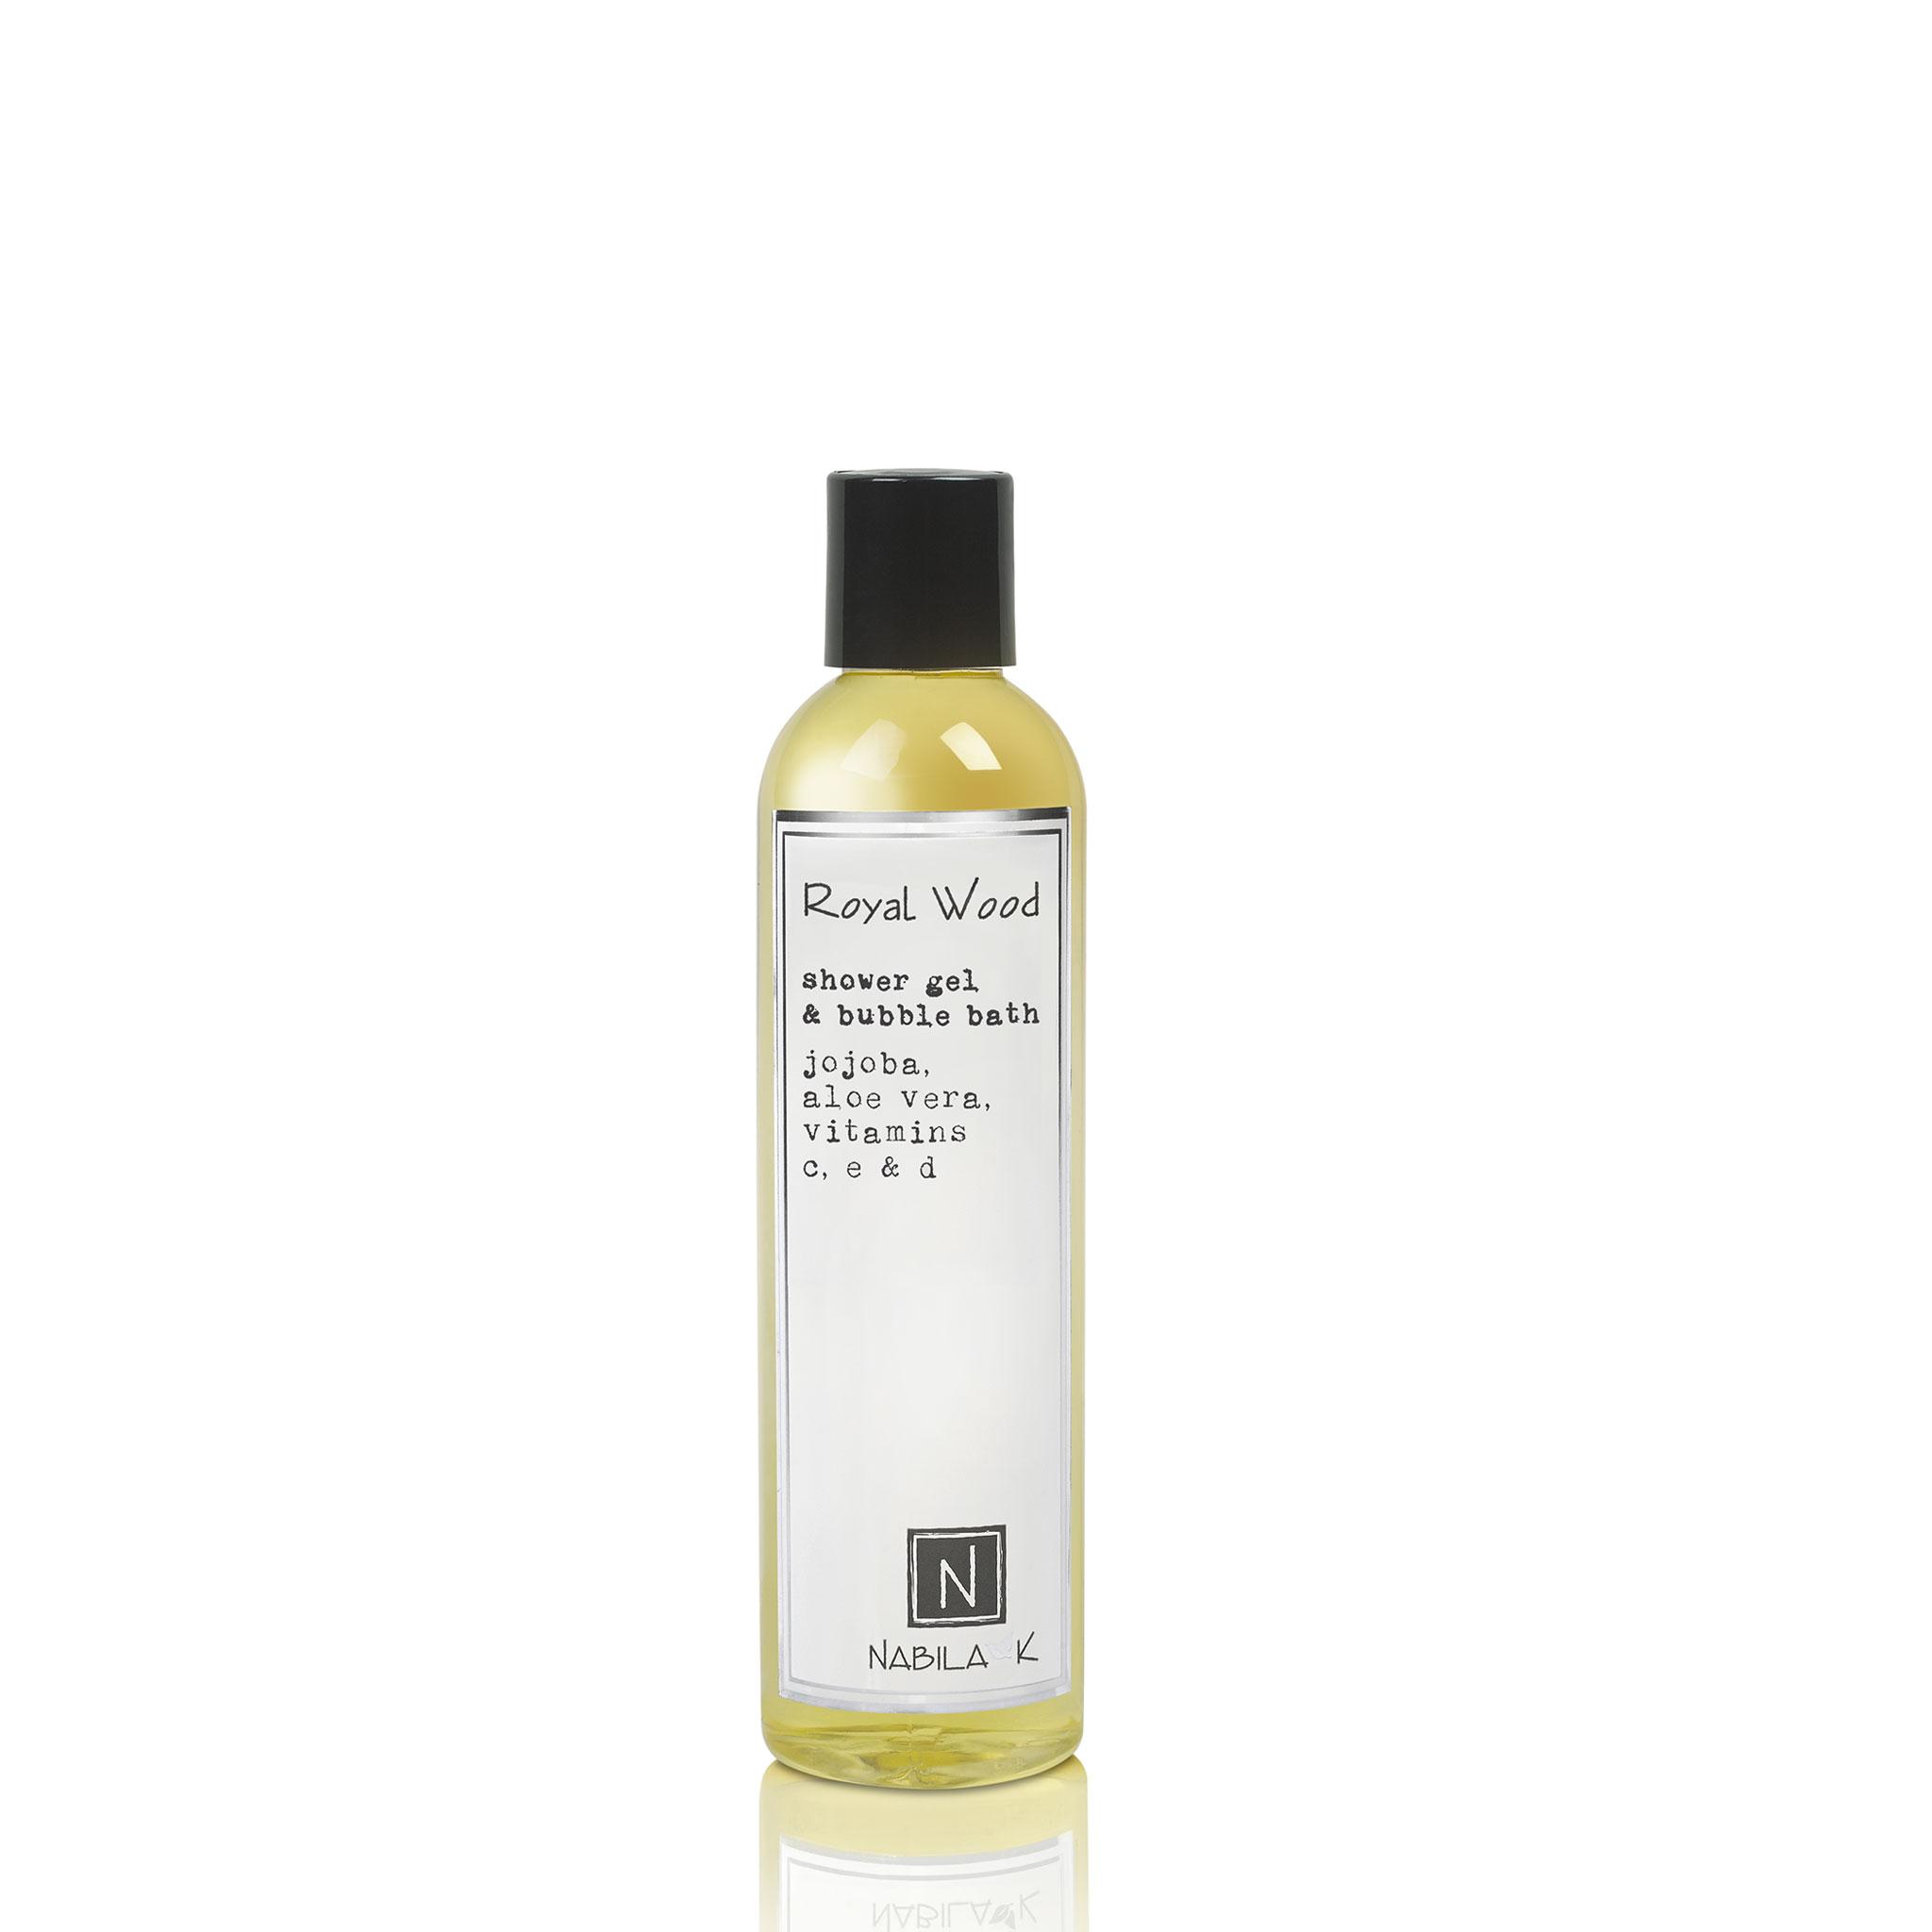 One Large Size Version of Nabila K's Royal Wood Shower Gel and Bubble Bath Jojoba, Aloe Vera, Vitamins C, E, & D